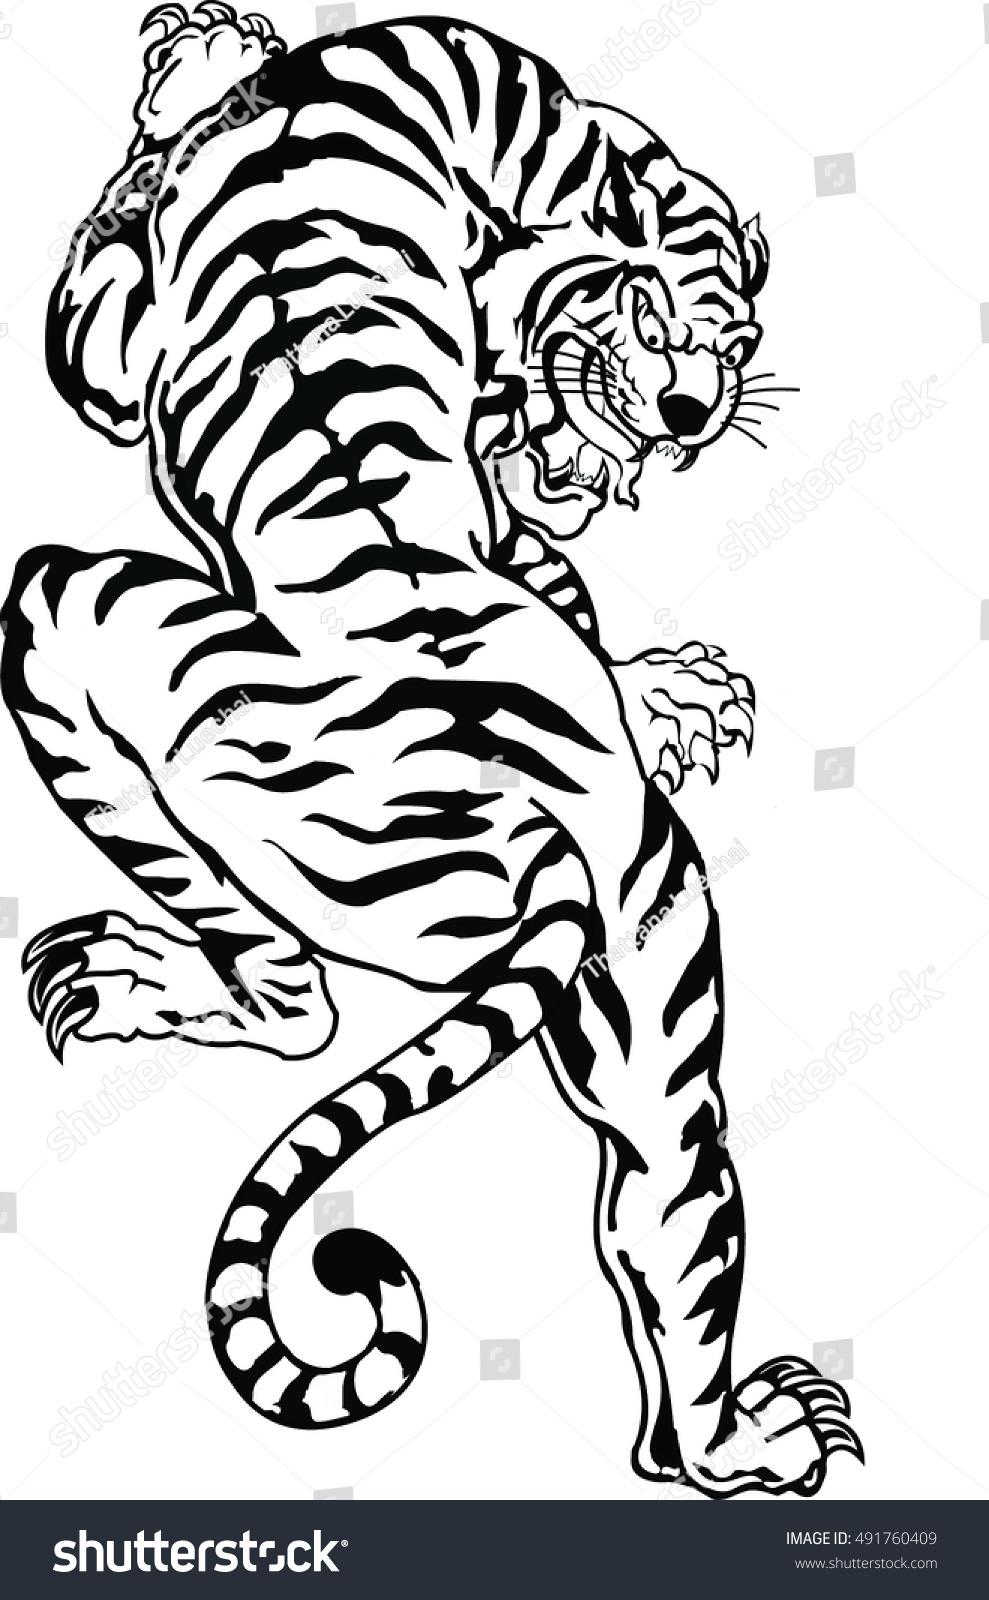 152b72cc Bengal Tiger Tattoo Stock Vector (Royalty Free) 491760409